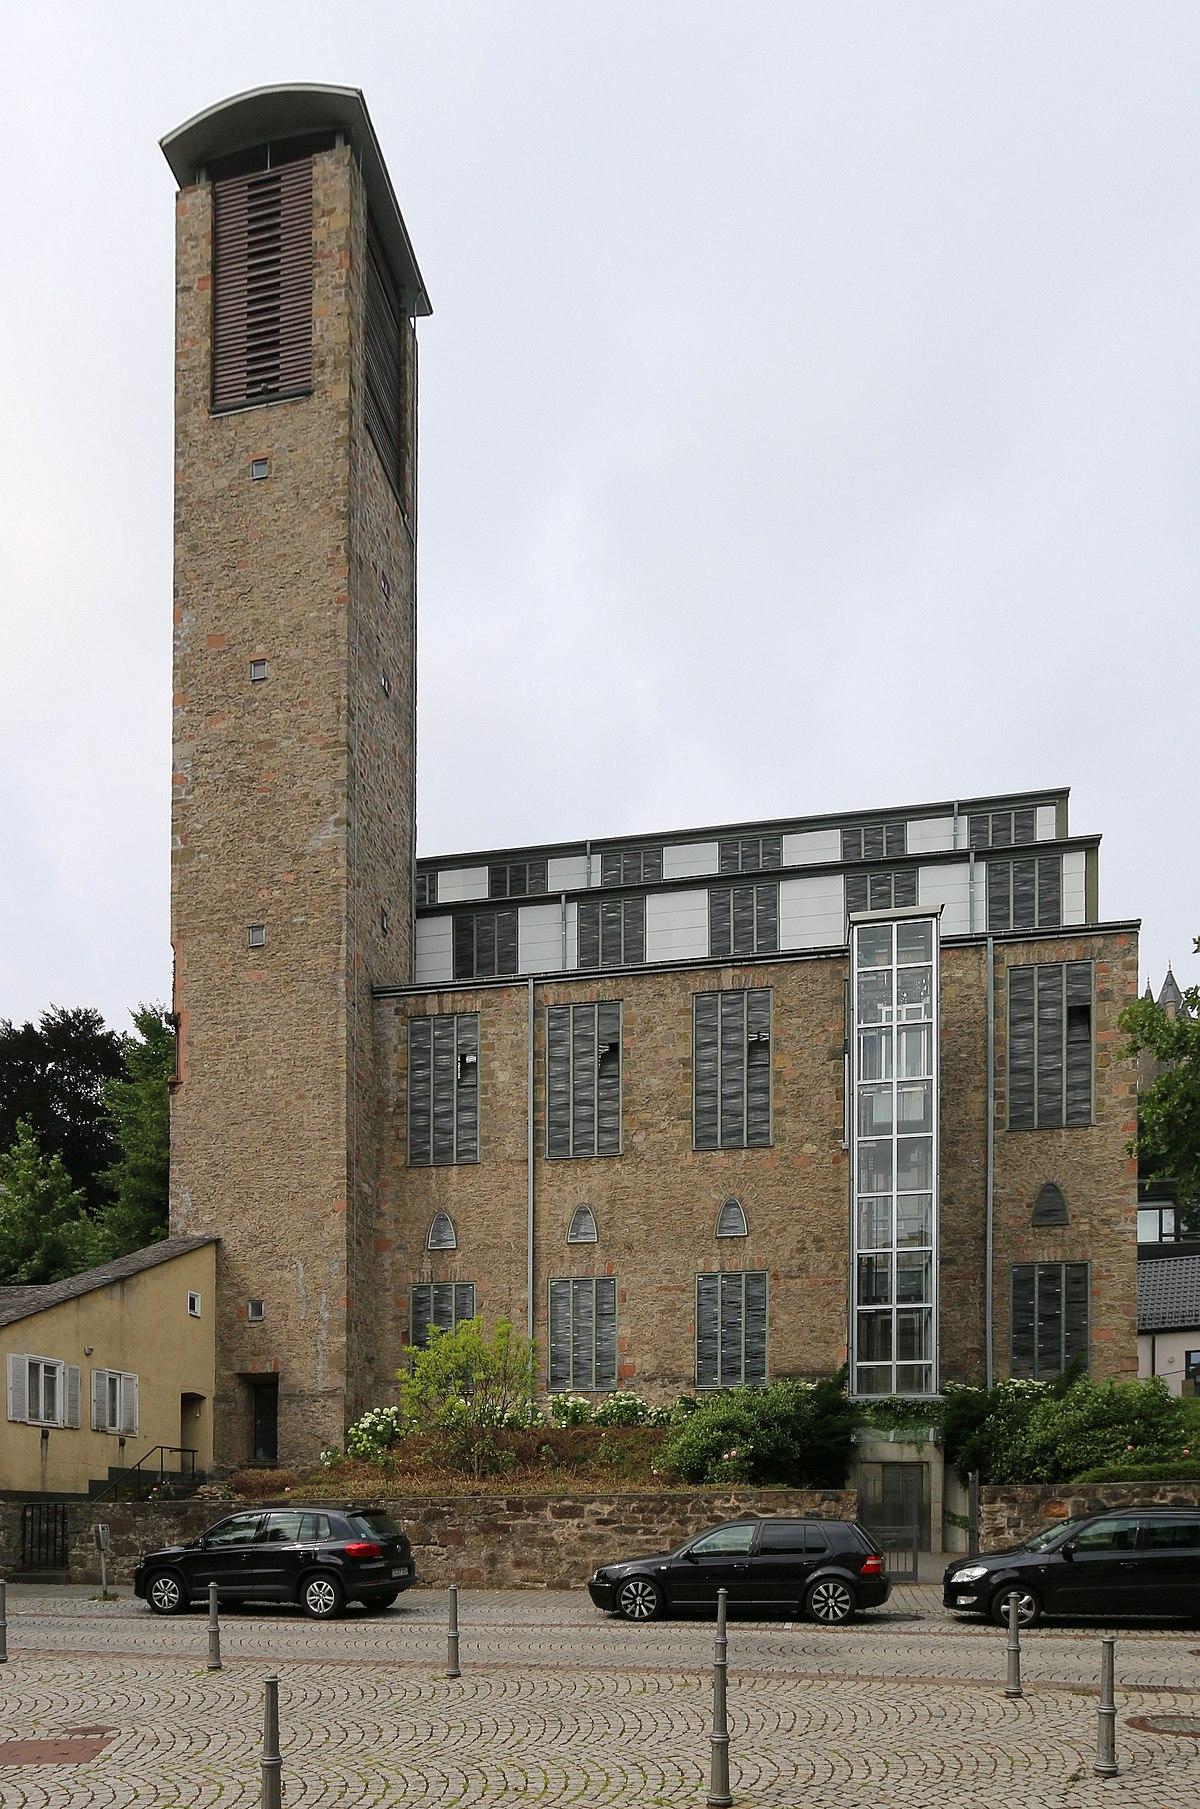 Datei:Dillenburg - Katholische Kirche (KD.HE 191609 1 08